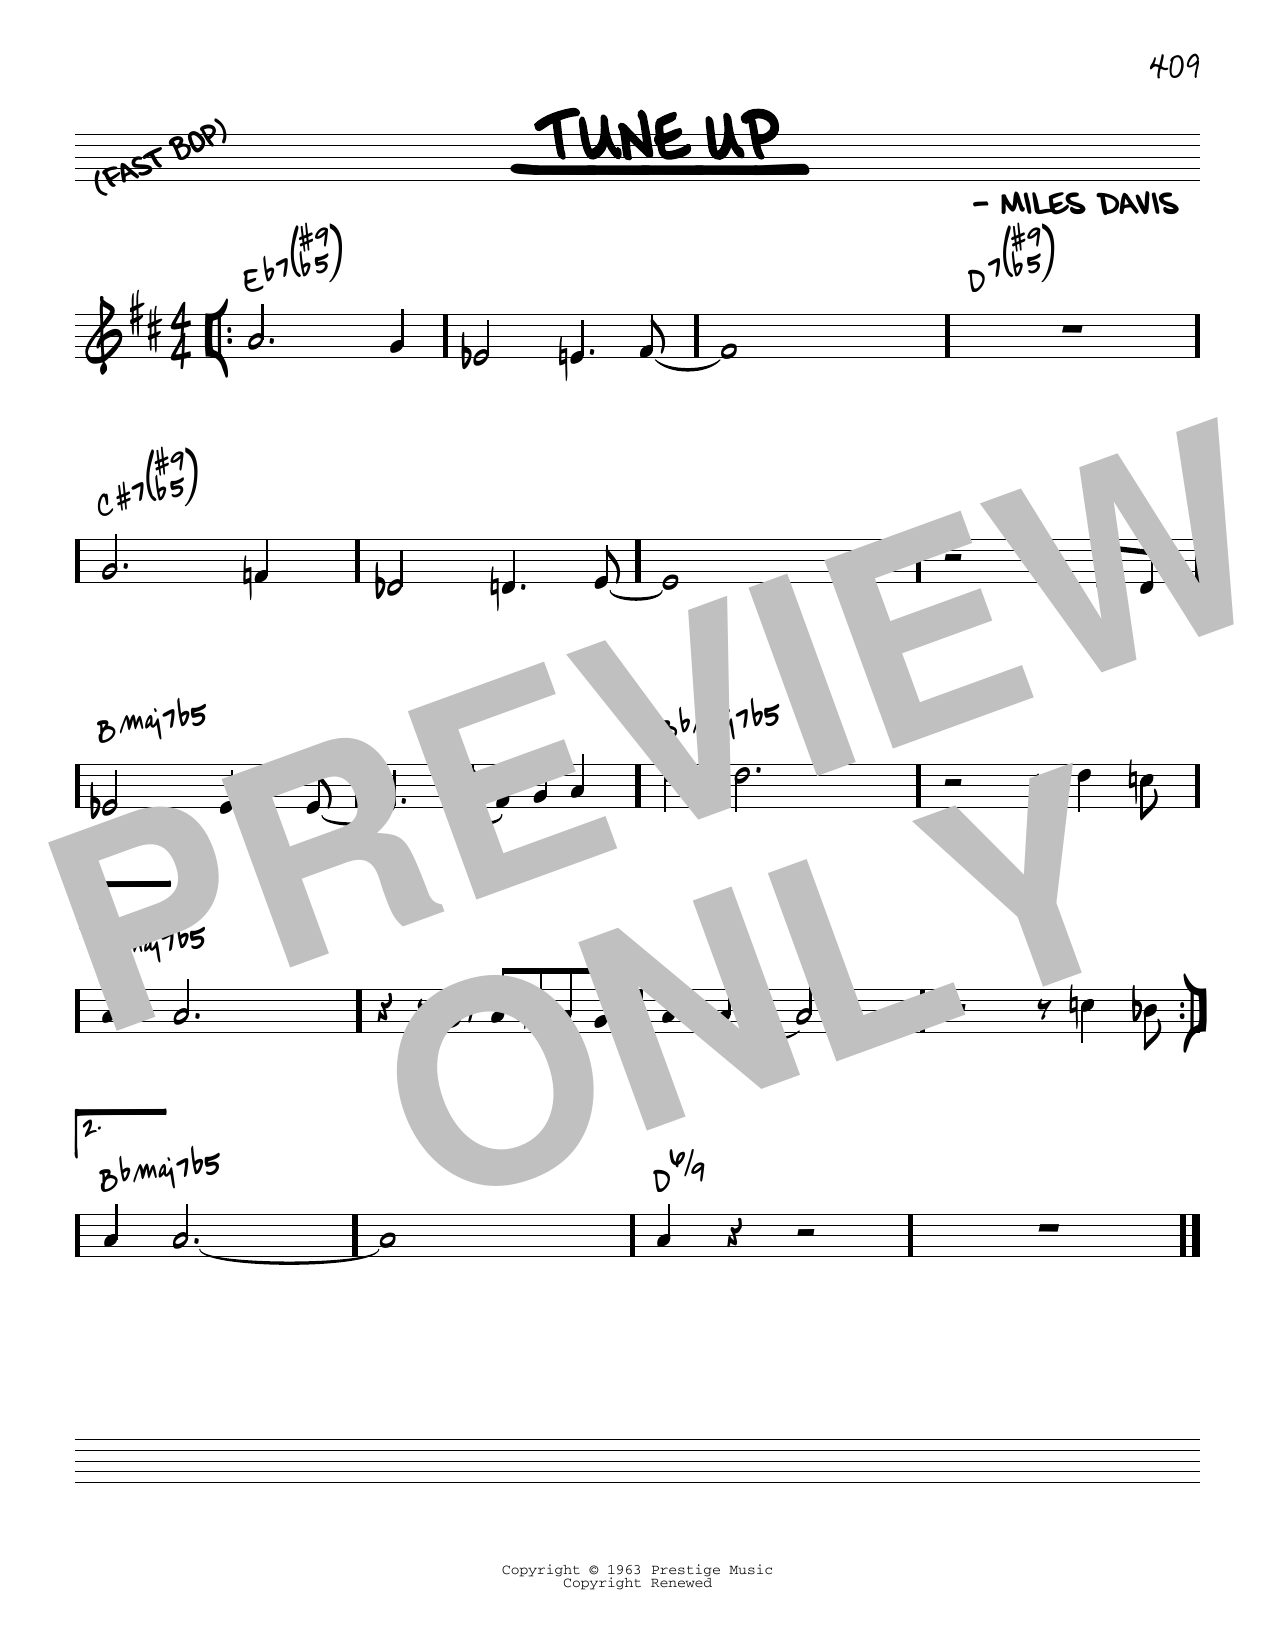 Miles Davis Tune Up [Reharmonized version] (arr. Jack Grassel) sheet music notes printable PDF score